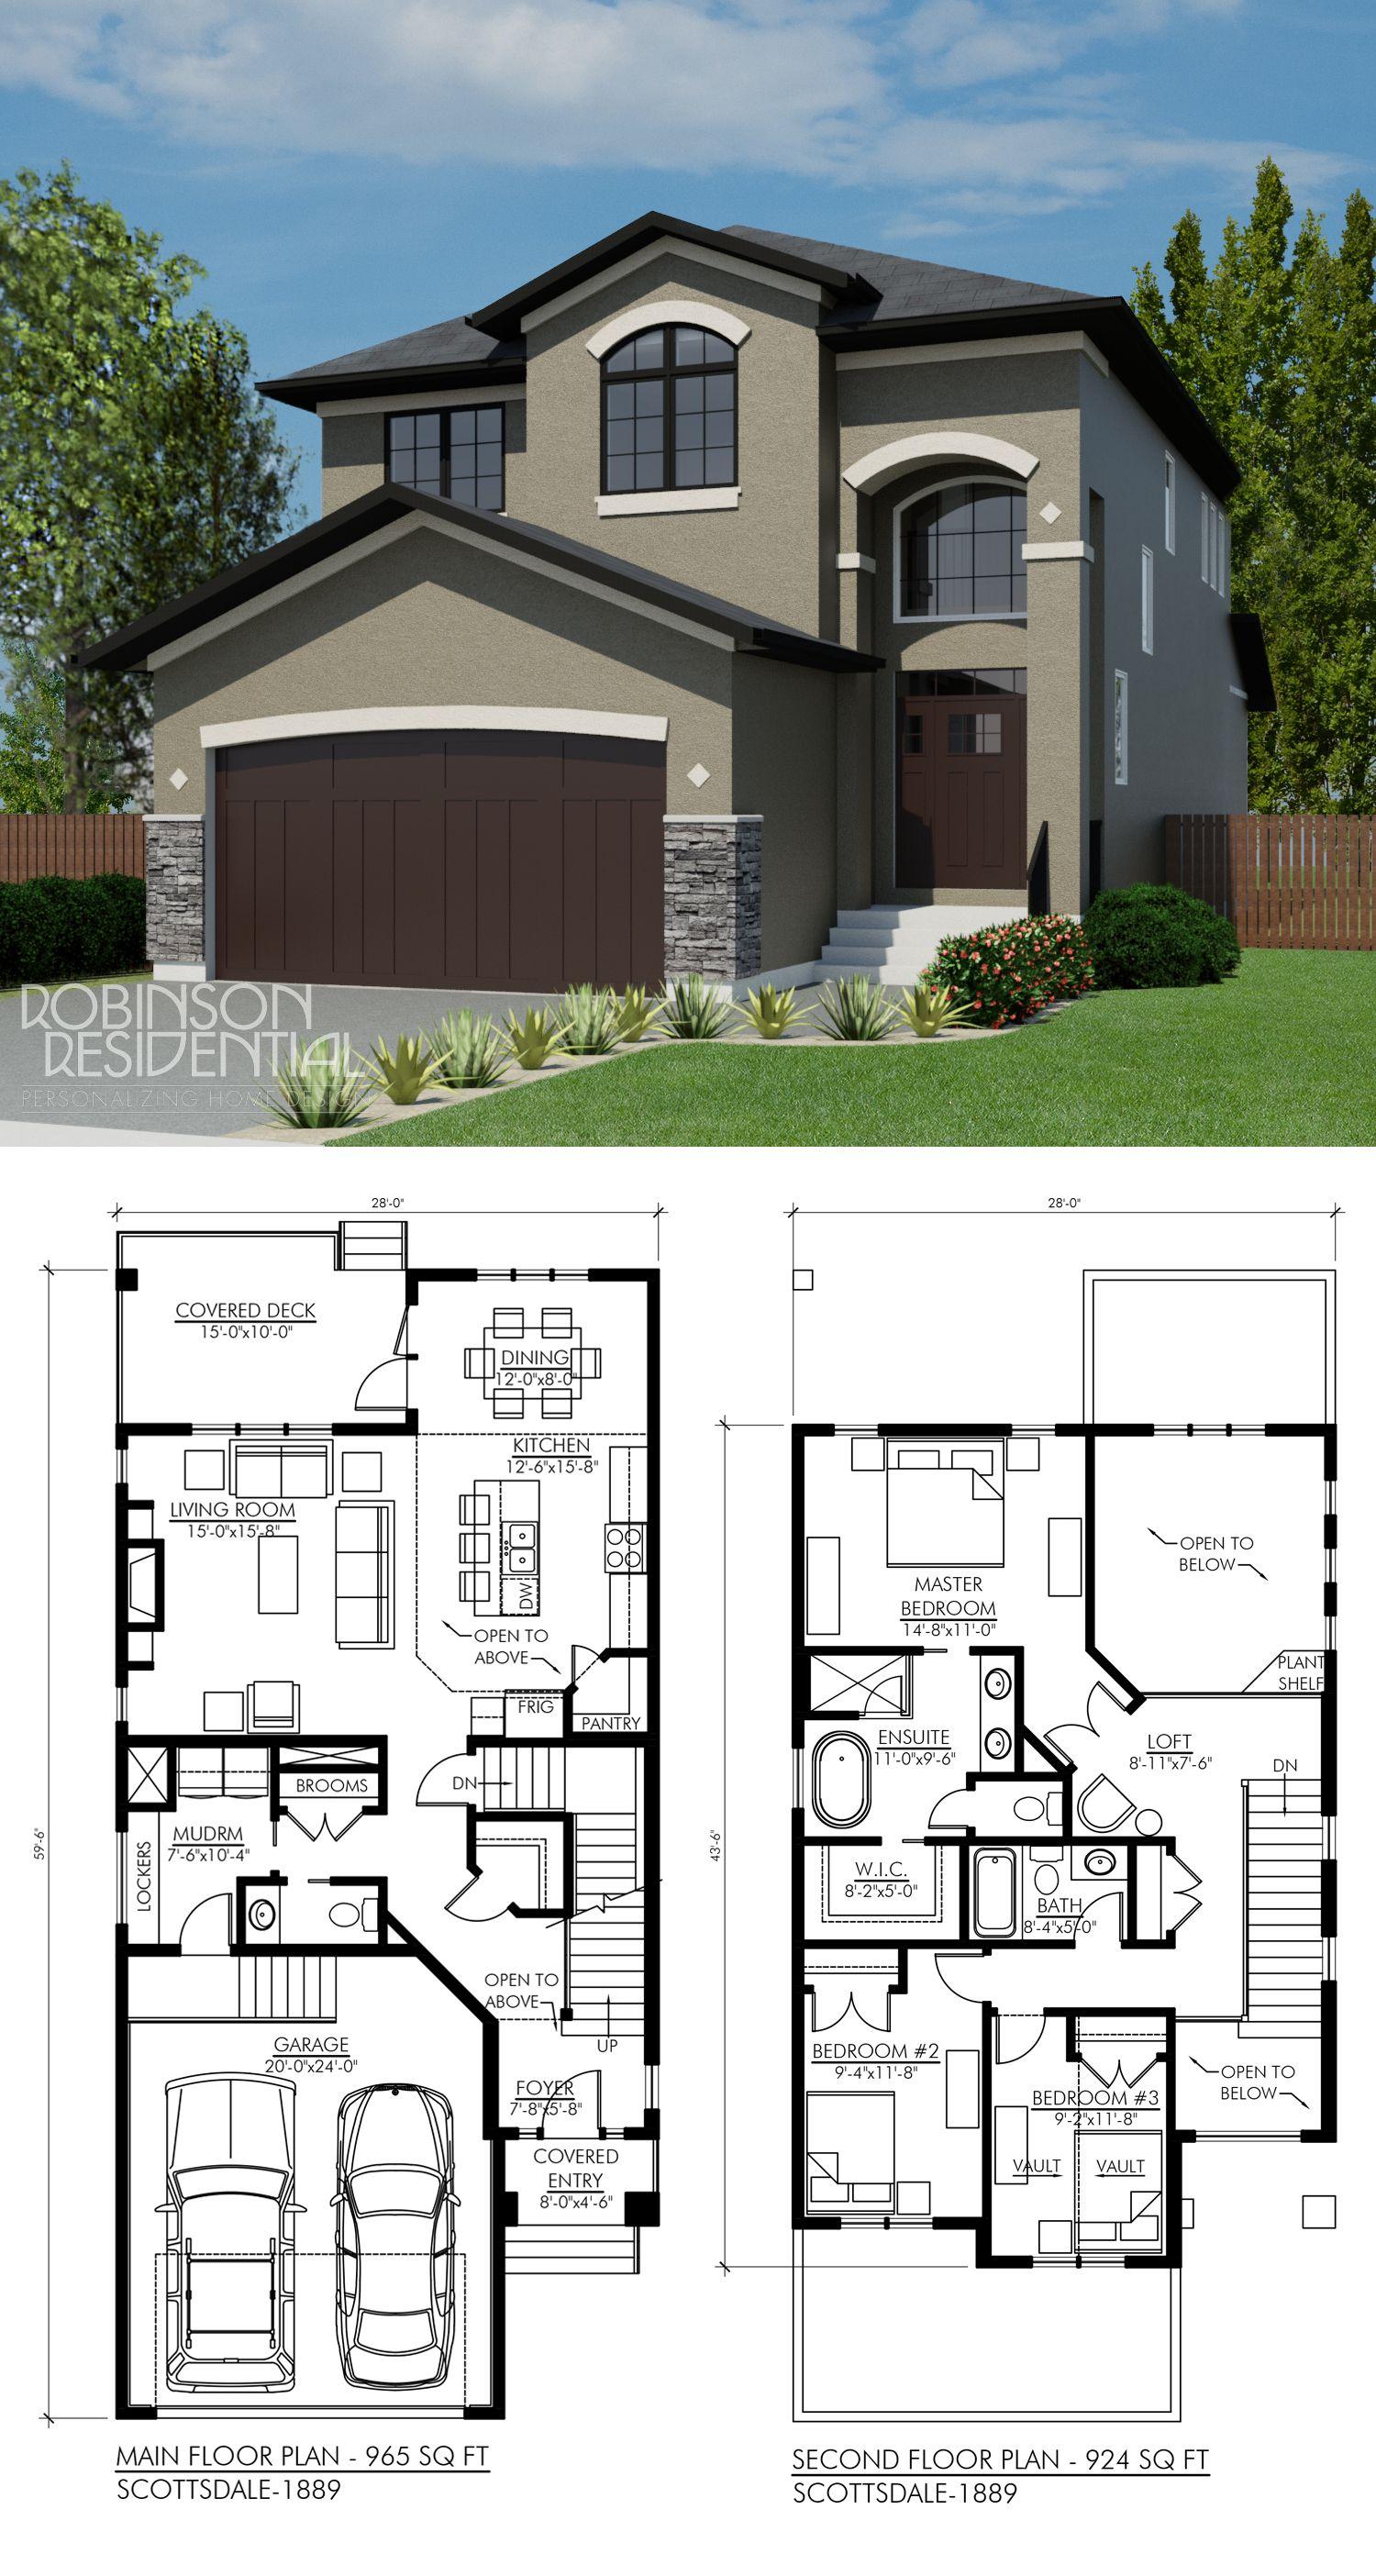 Mission Scottsdale-1889 - Robinson Plans | Sims house ...